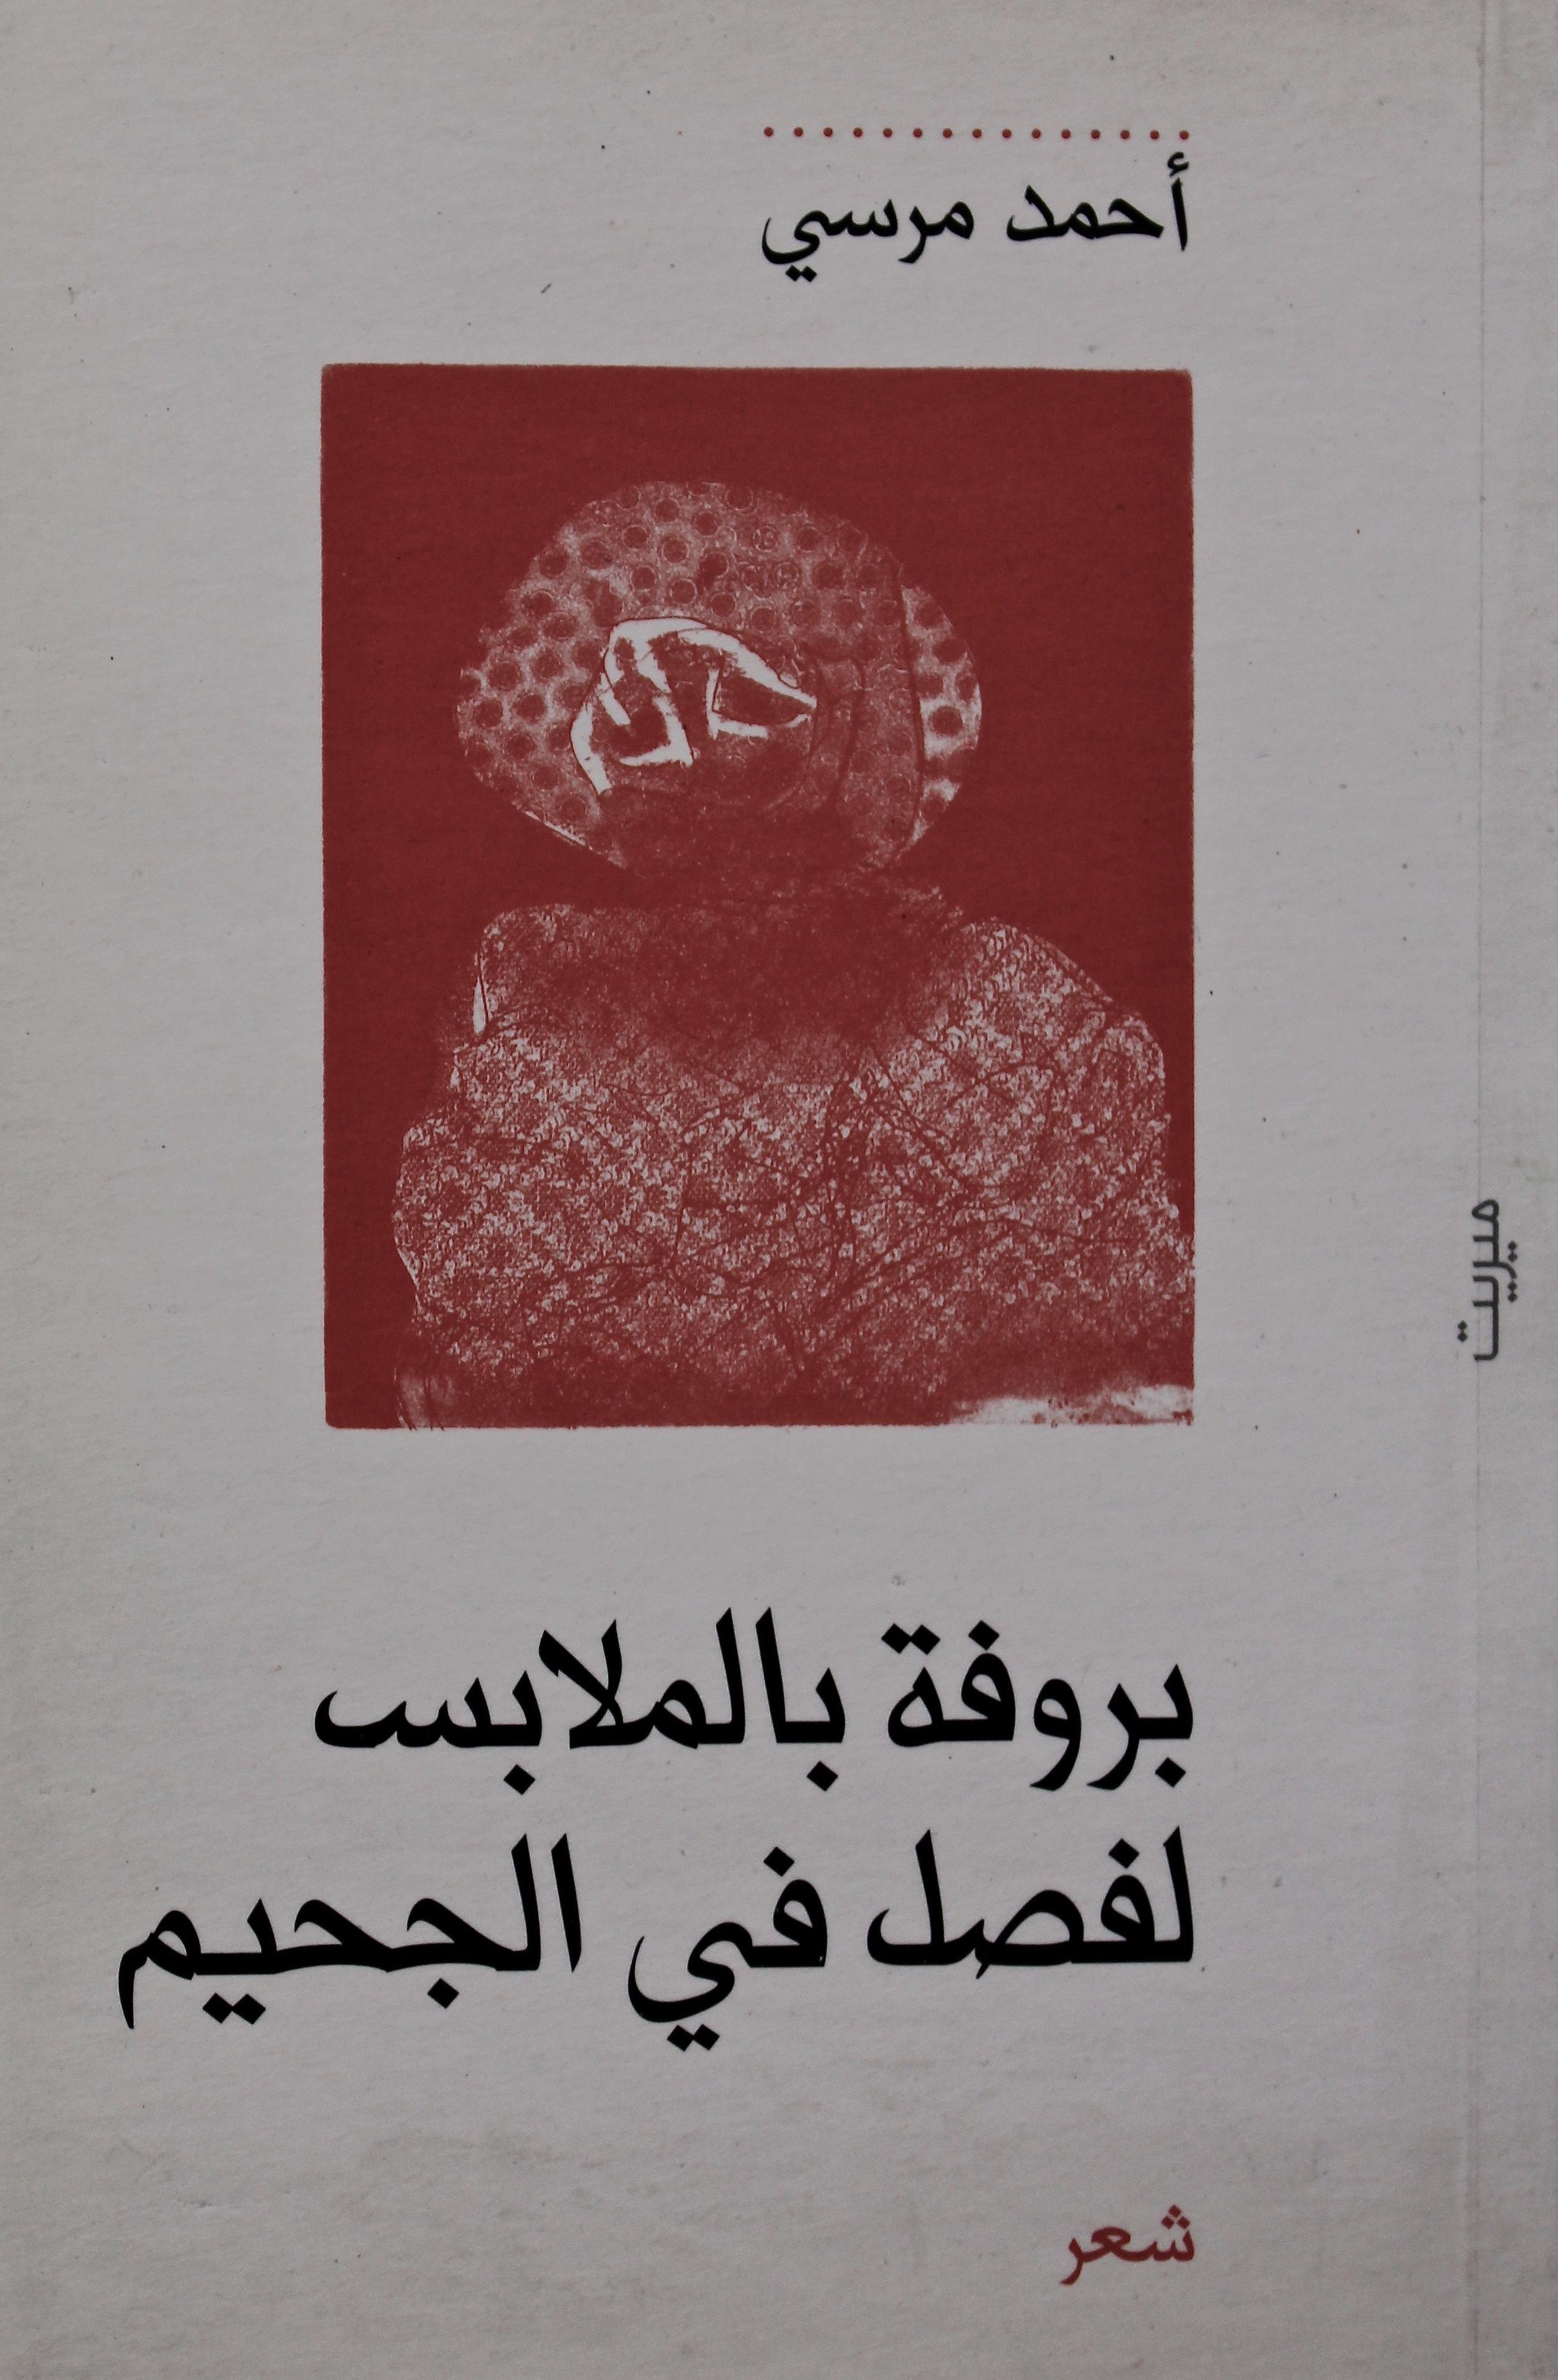 Cover by M. Omar Khalil